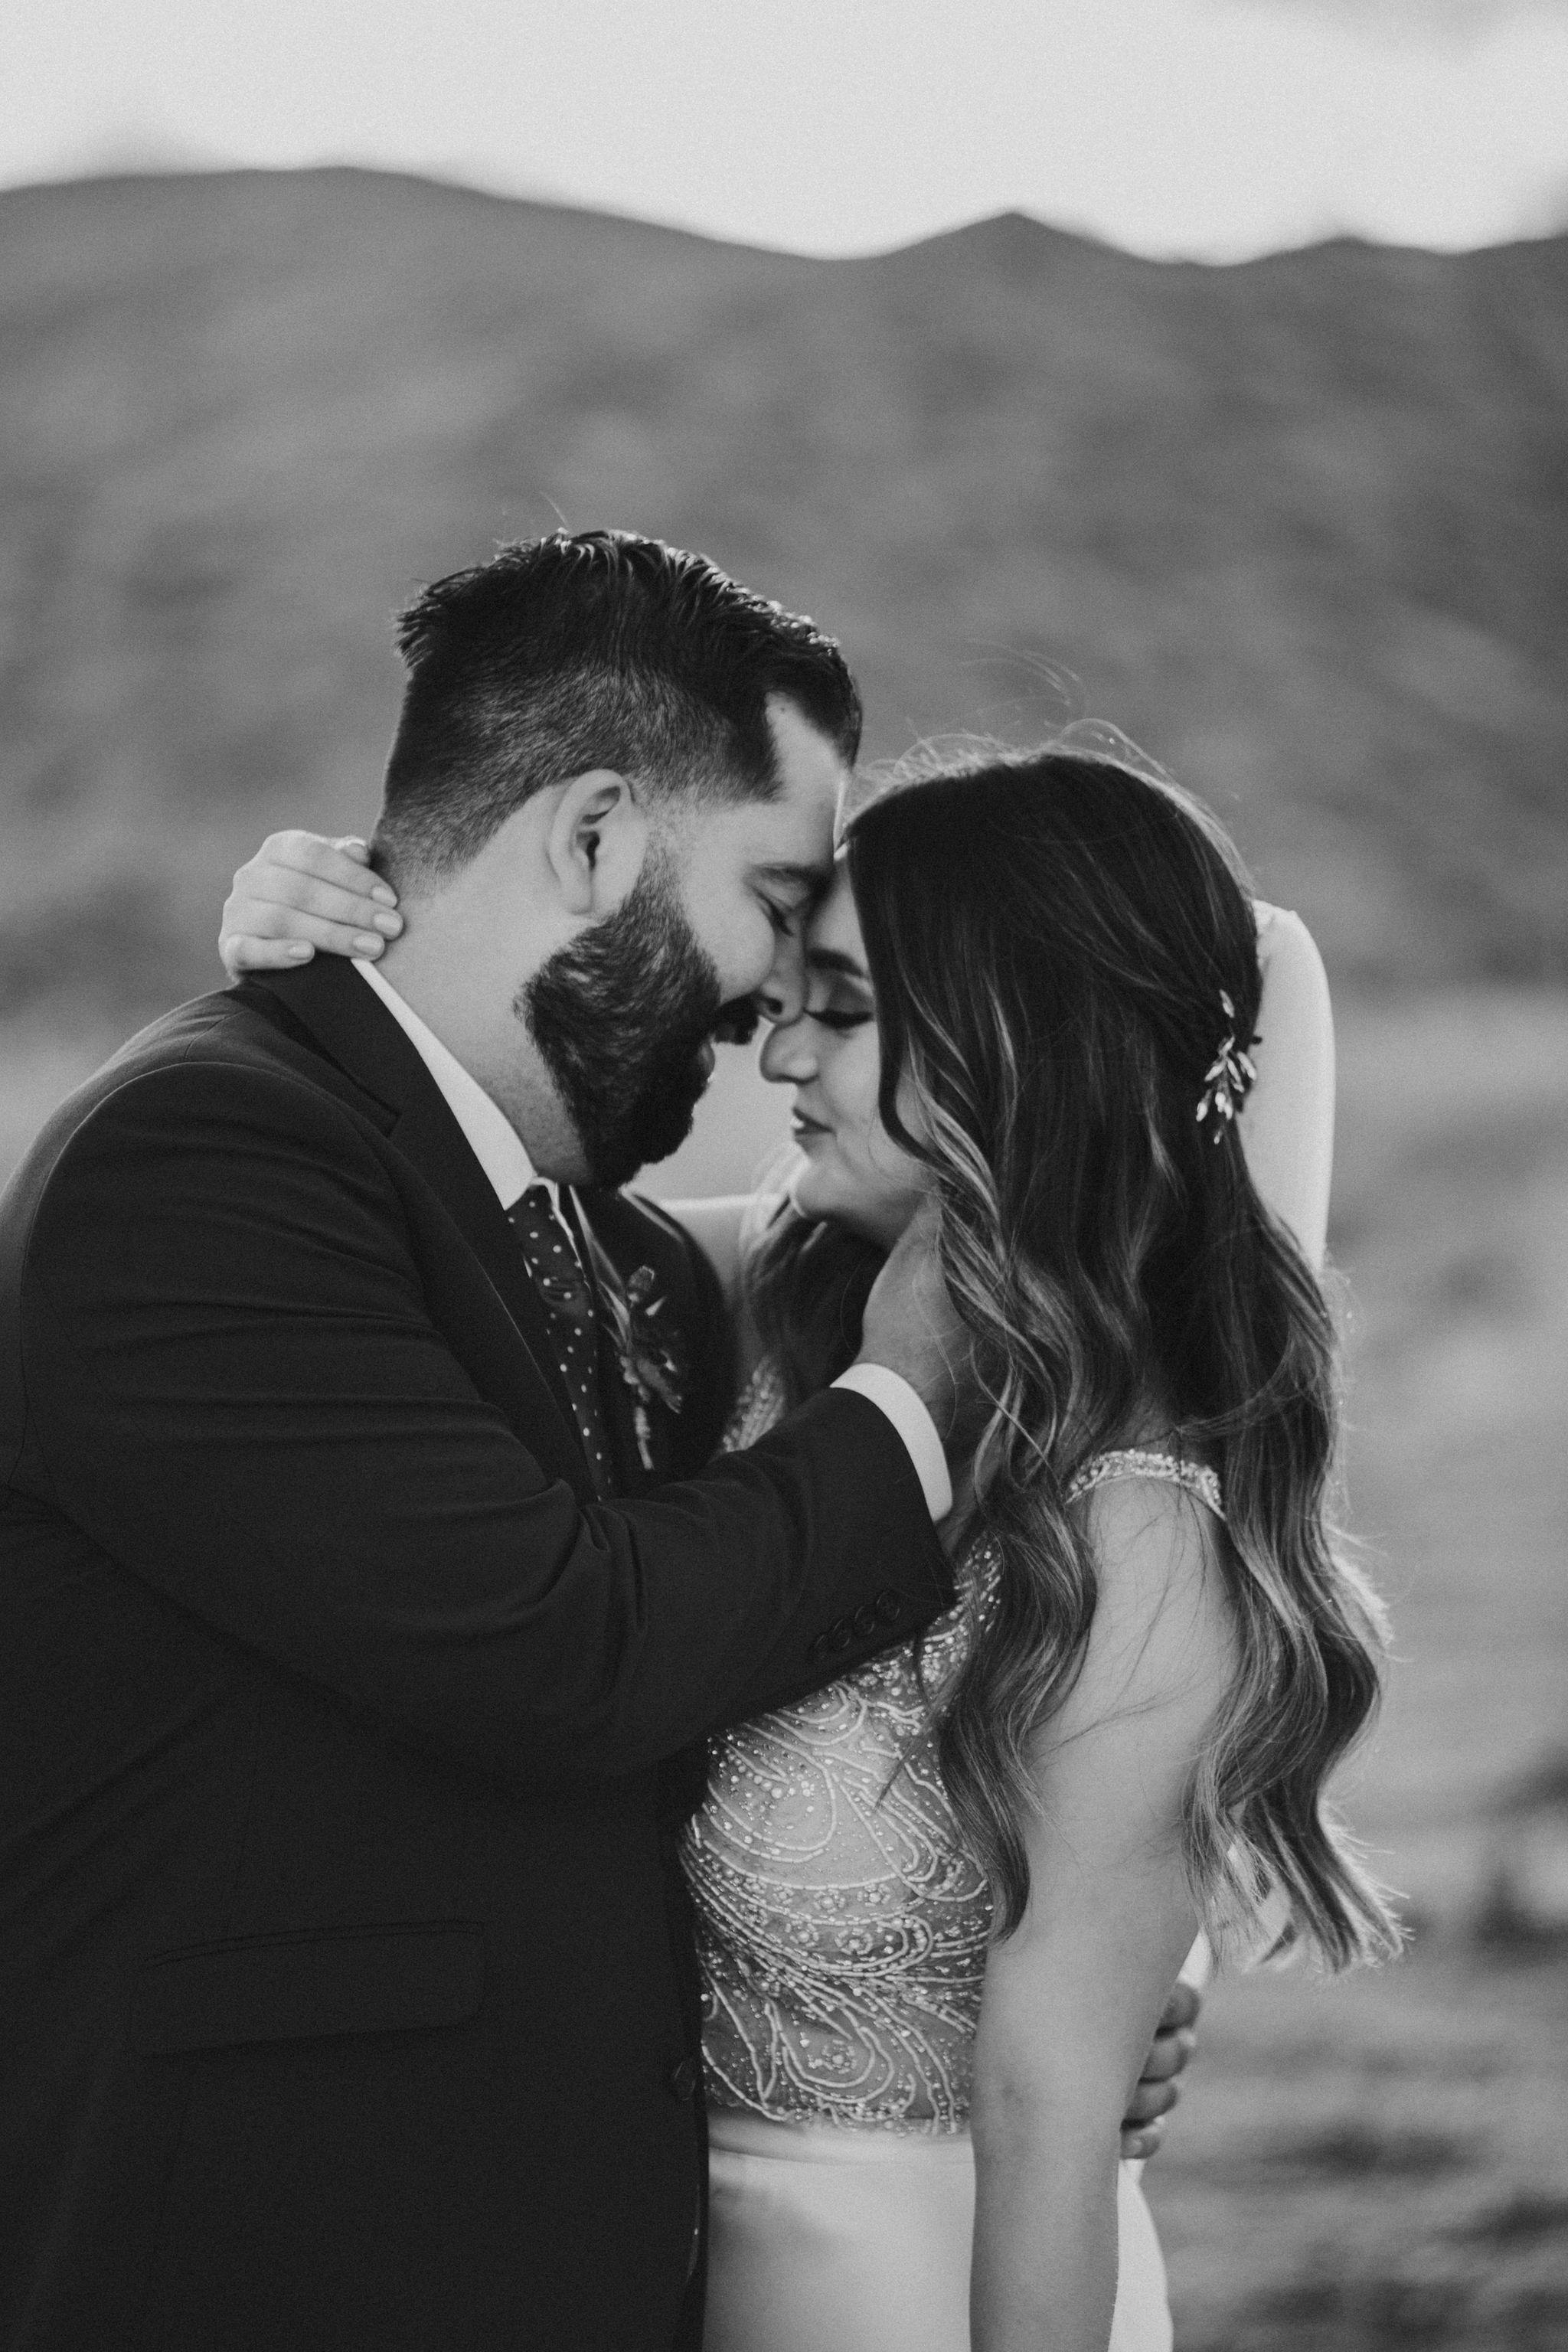 RimrockRanch-JoshuaTree-Wedding-Jami-Laree-638.jpg